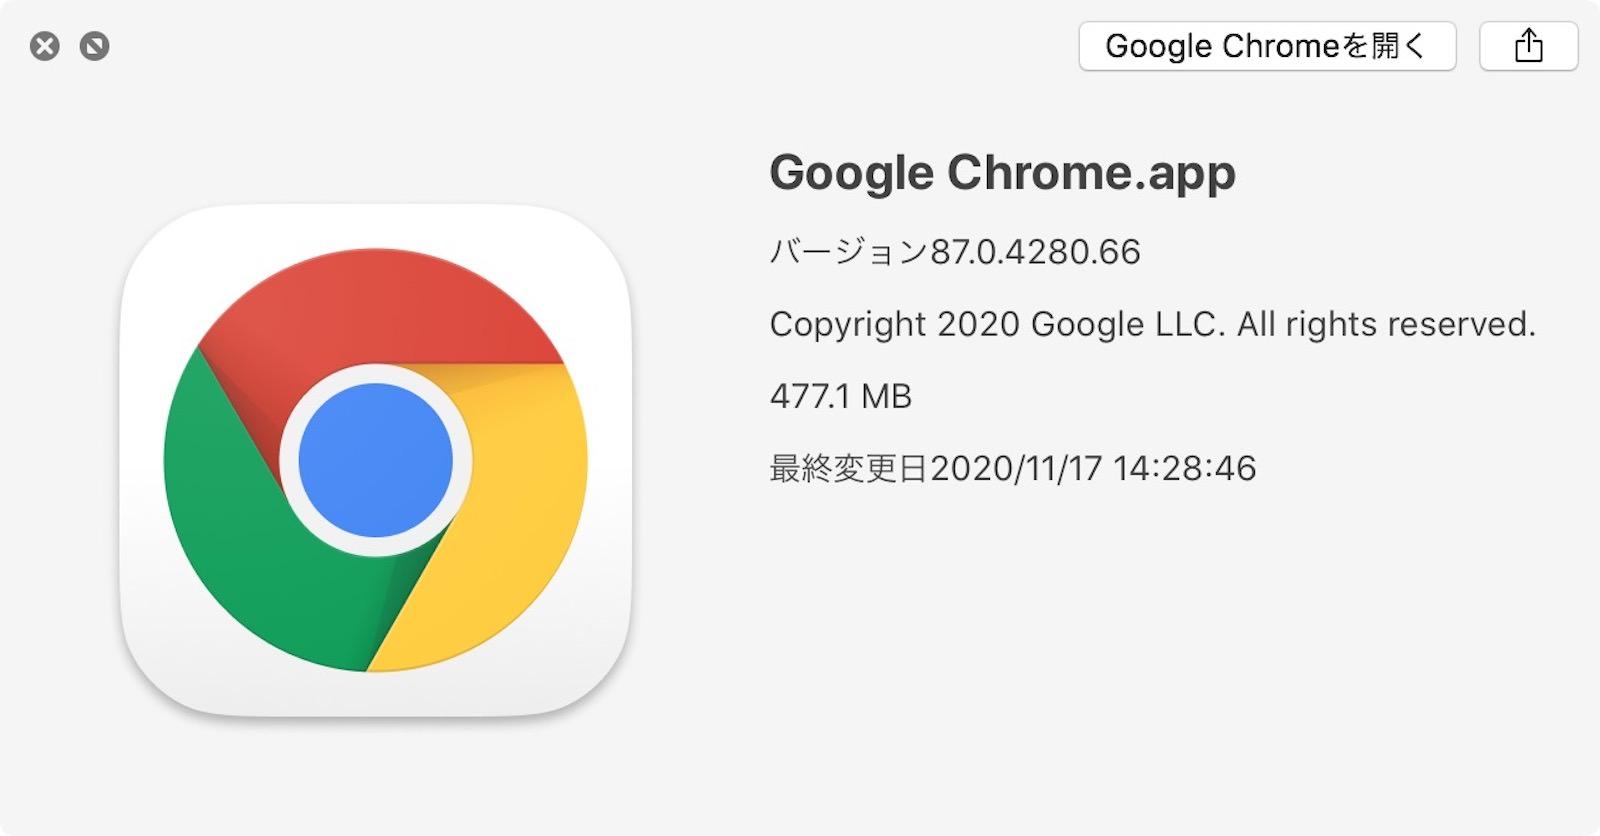 Google chrome 87 latest version